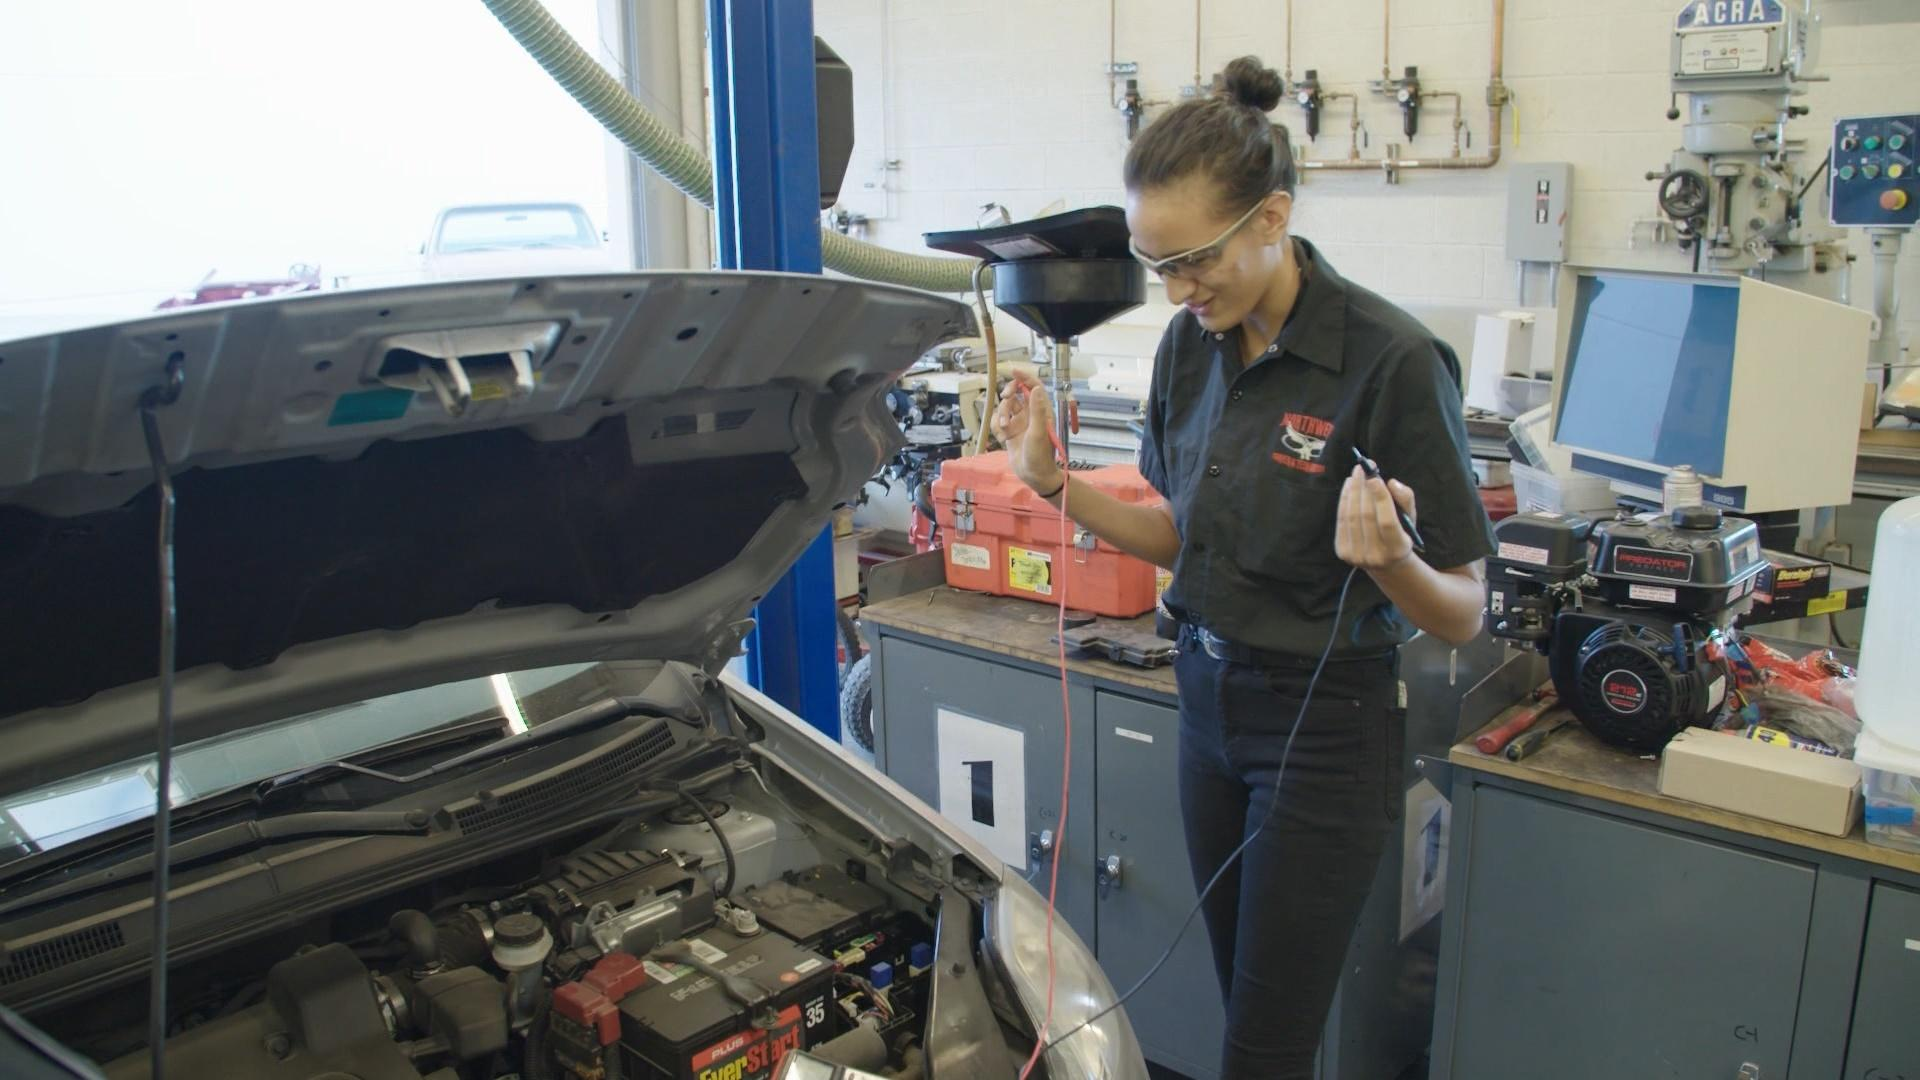 Preparing Students for Life at Northwest CTA